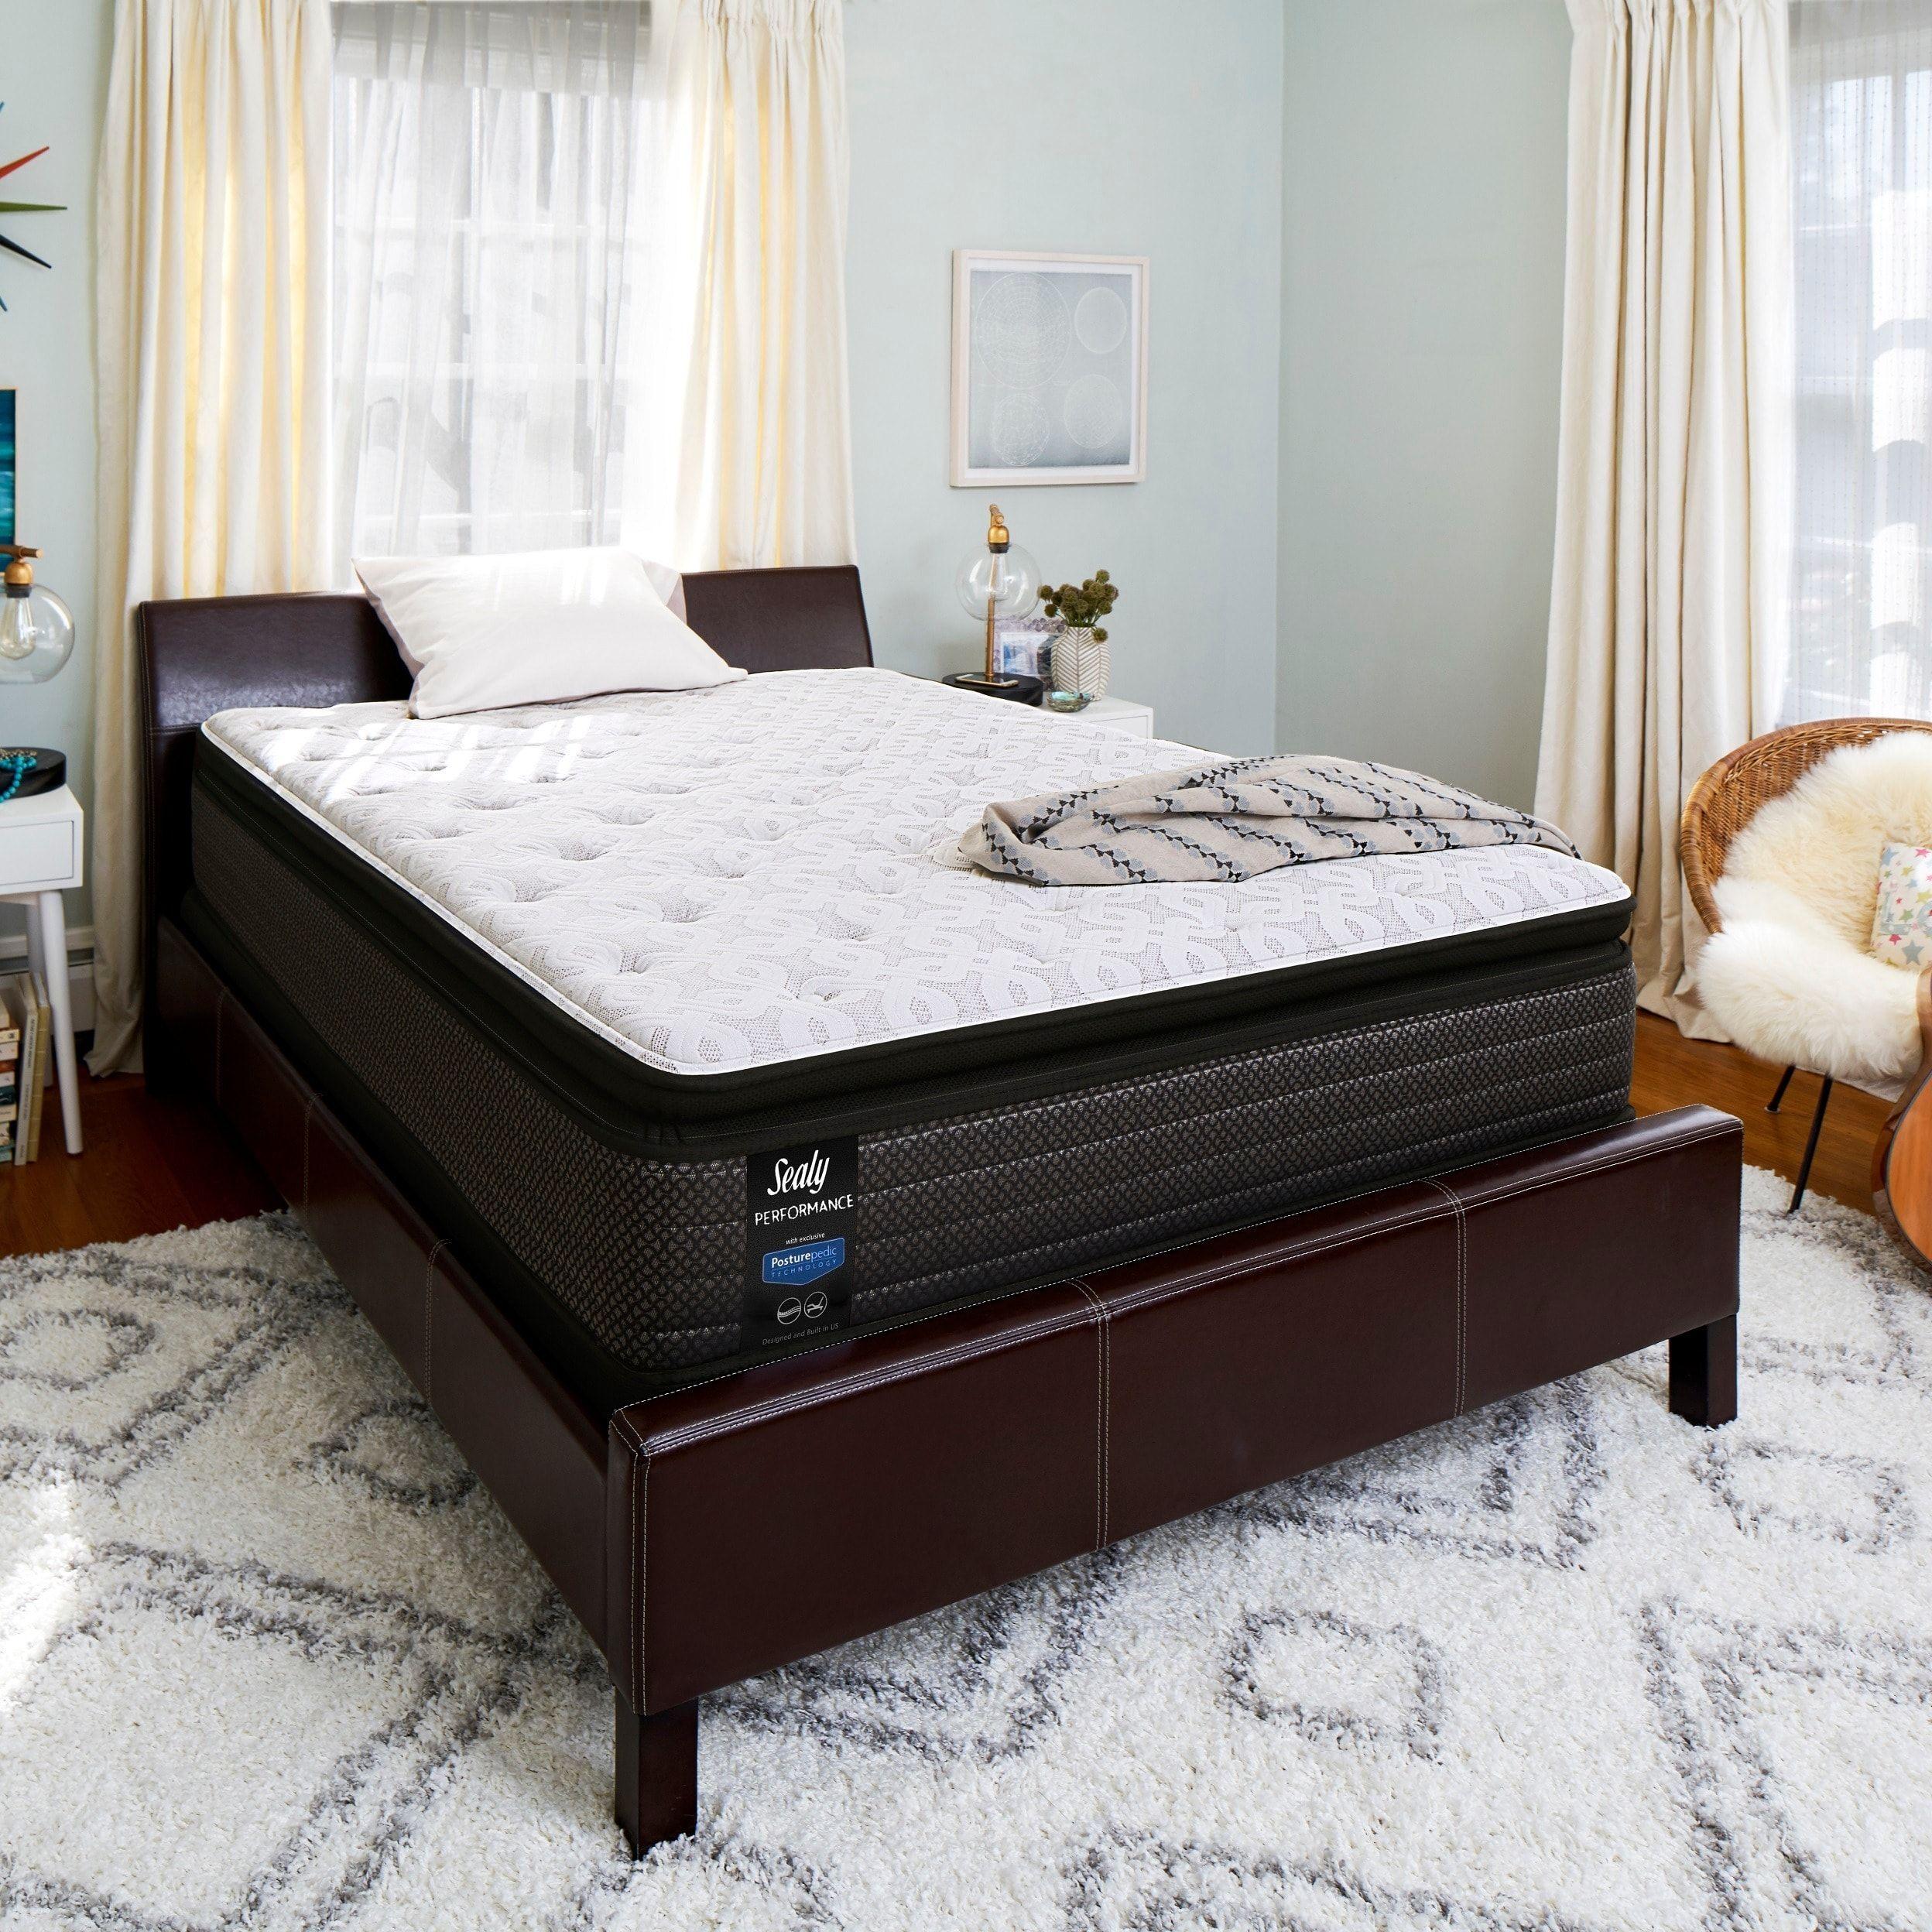 9 Beautiful Queen Plush Euro Pillow Top Mattress In Room